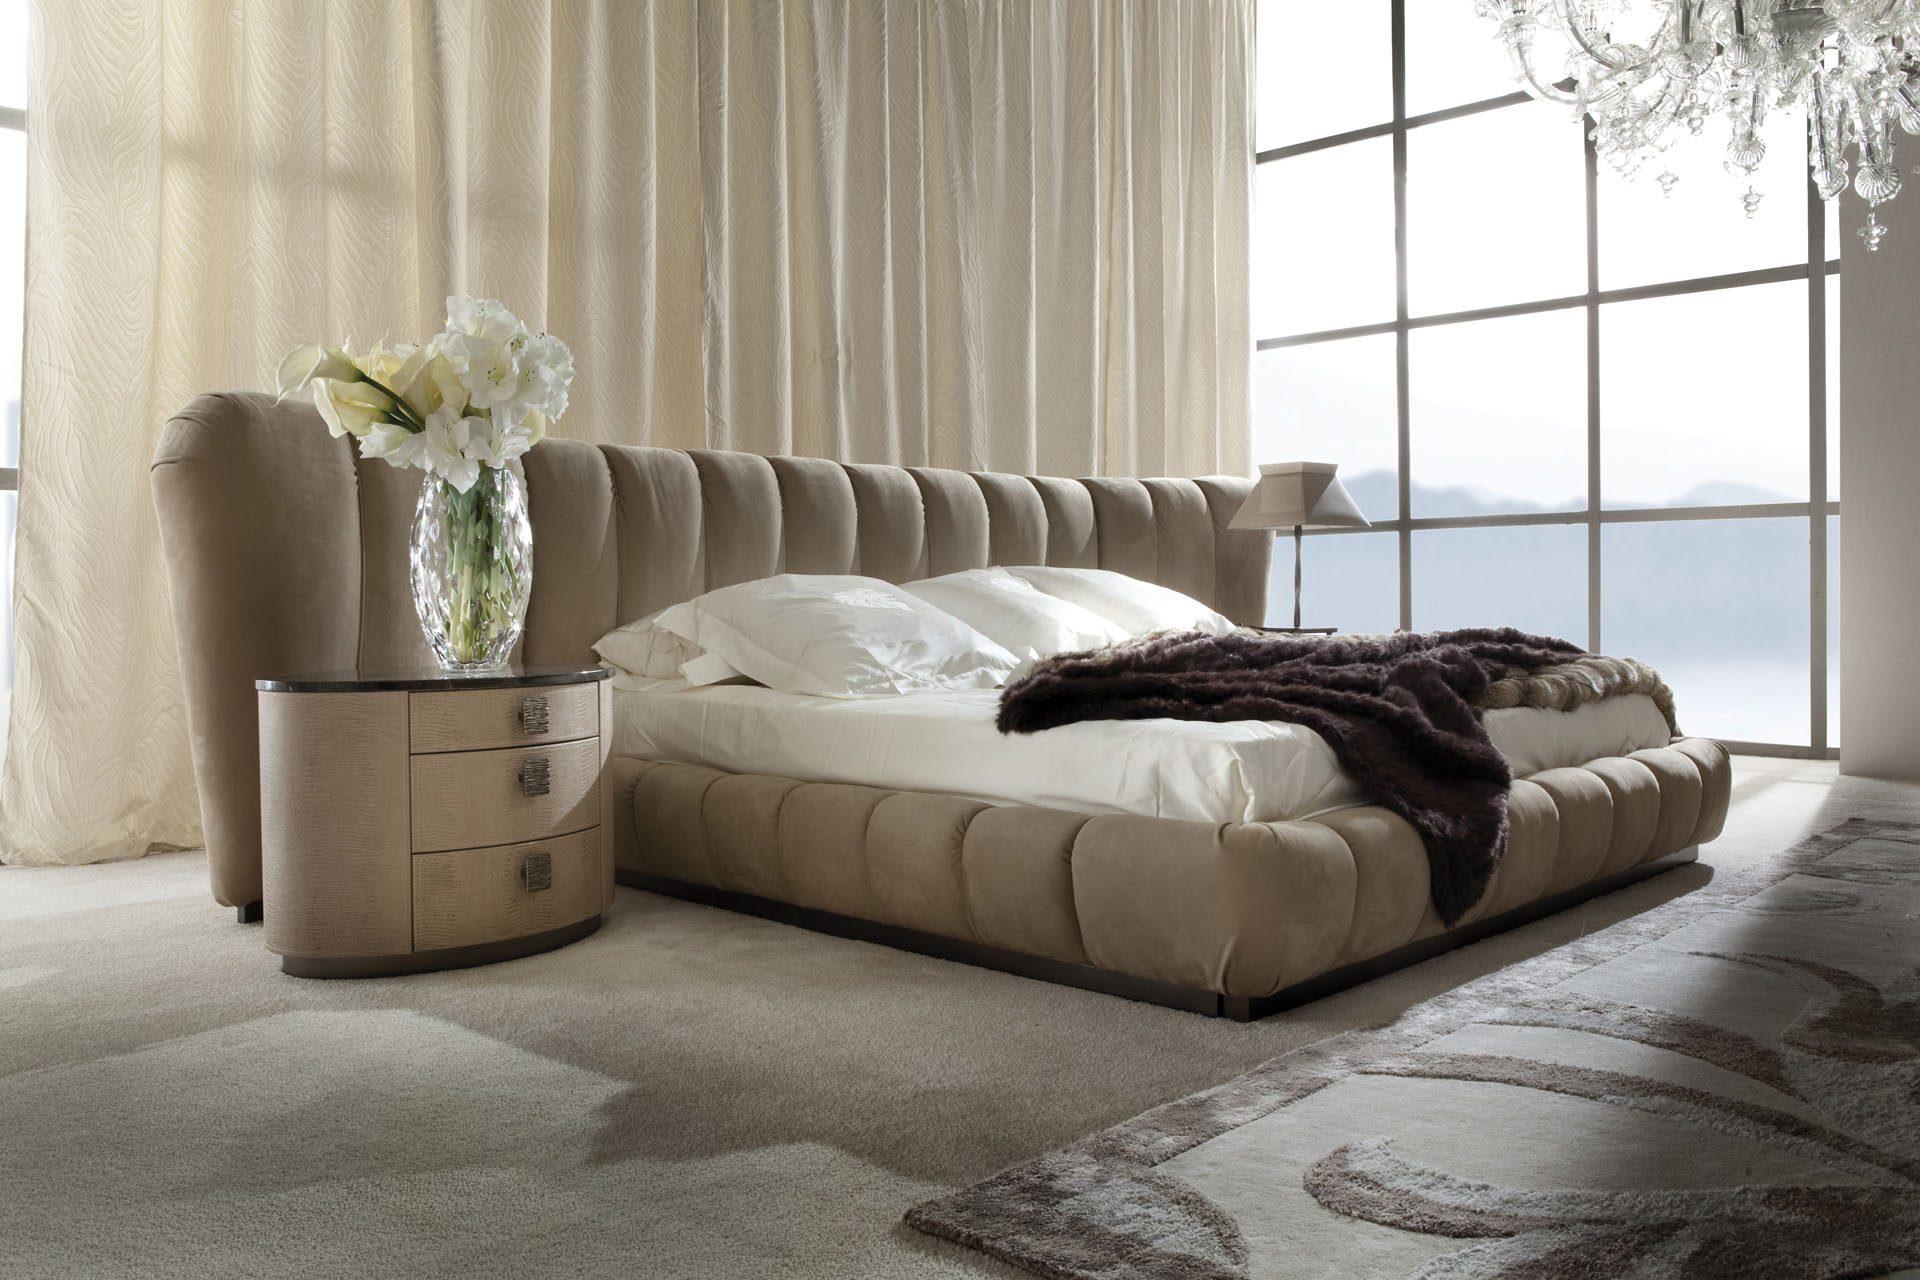 Lifetime Bed